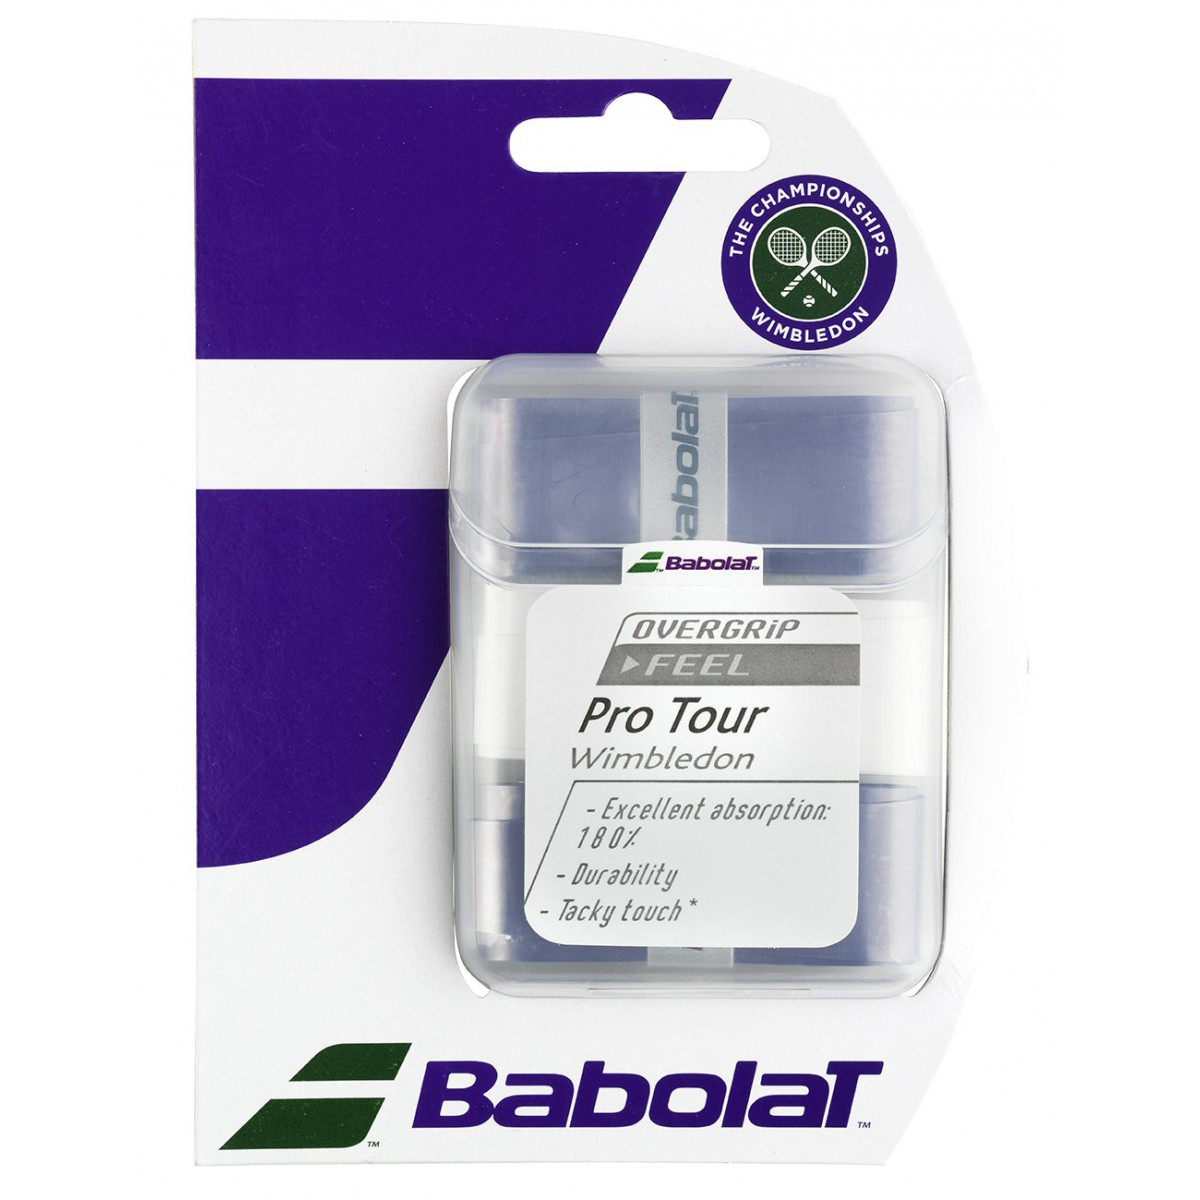 Babolat Pro Tour Wimbledon Bianco-Viola (3x) 1